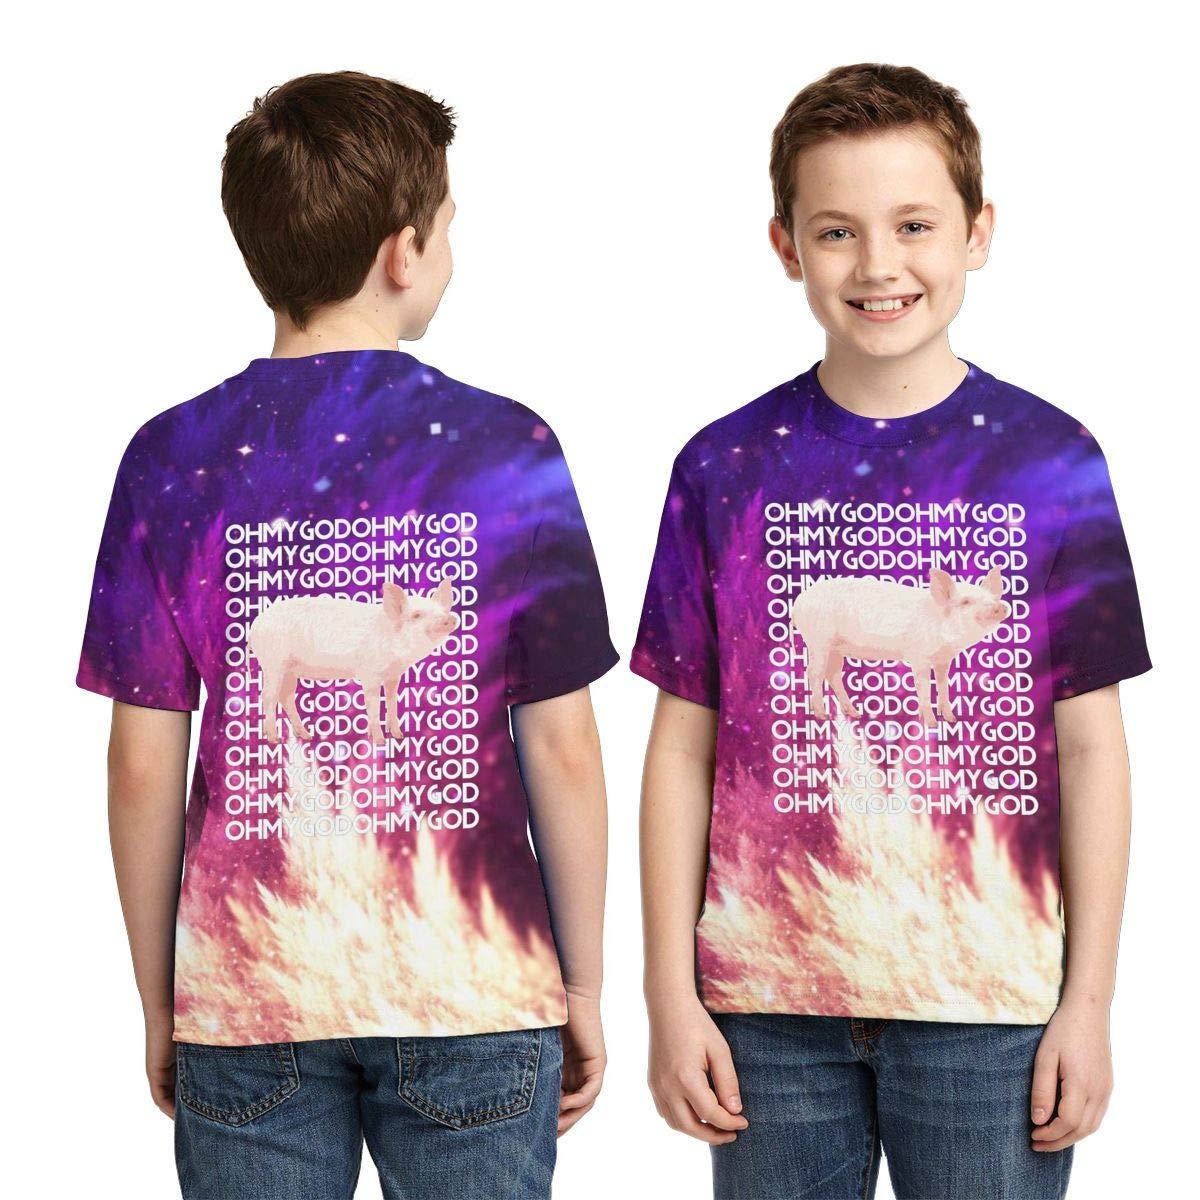 Zengqinglove Boys,Girls,Youth Oh My God Pig T Shirt